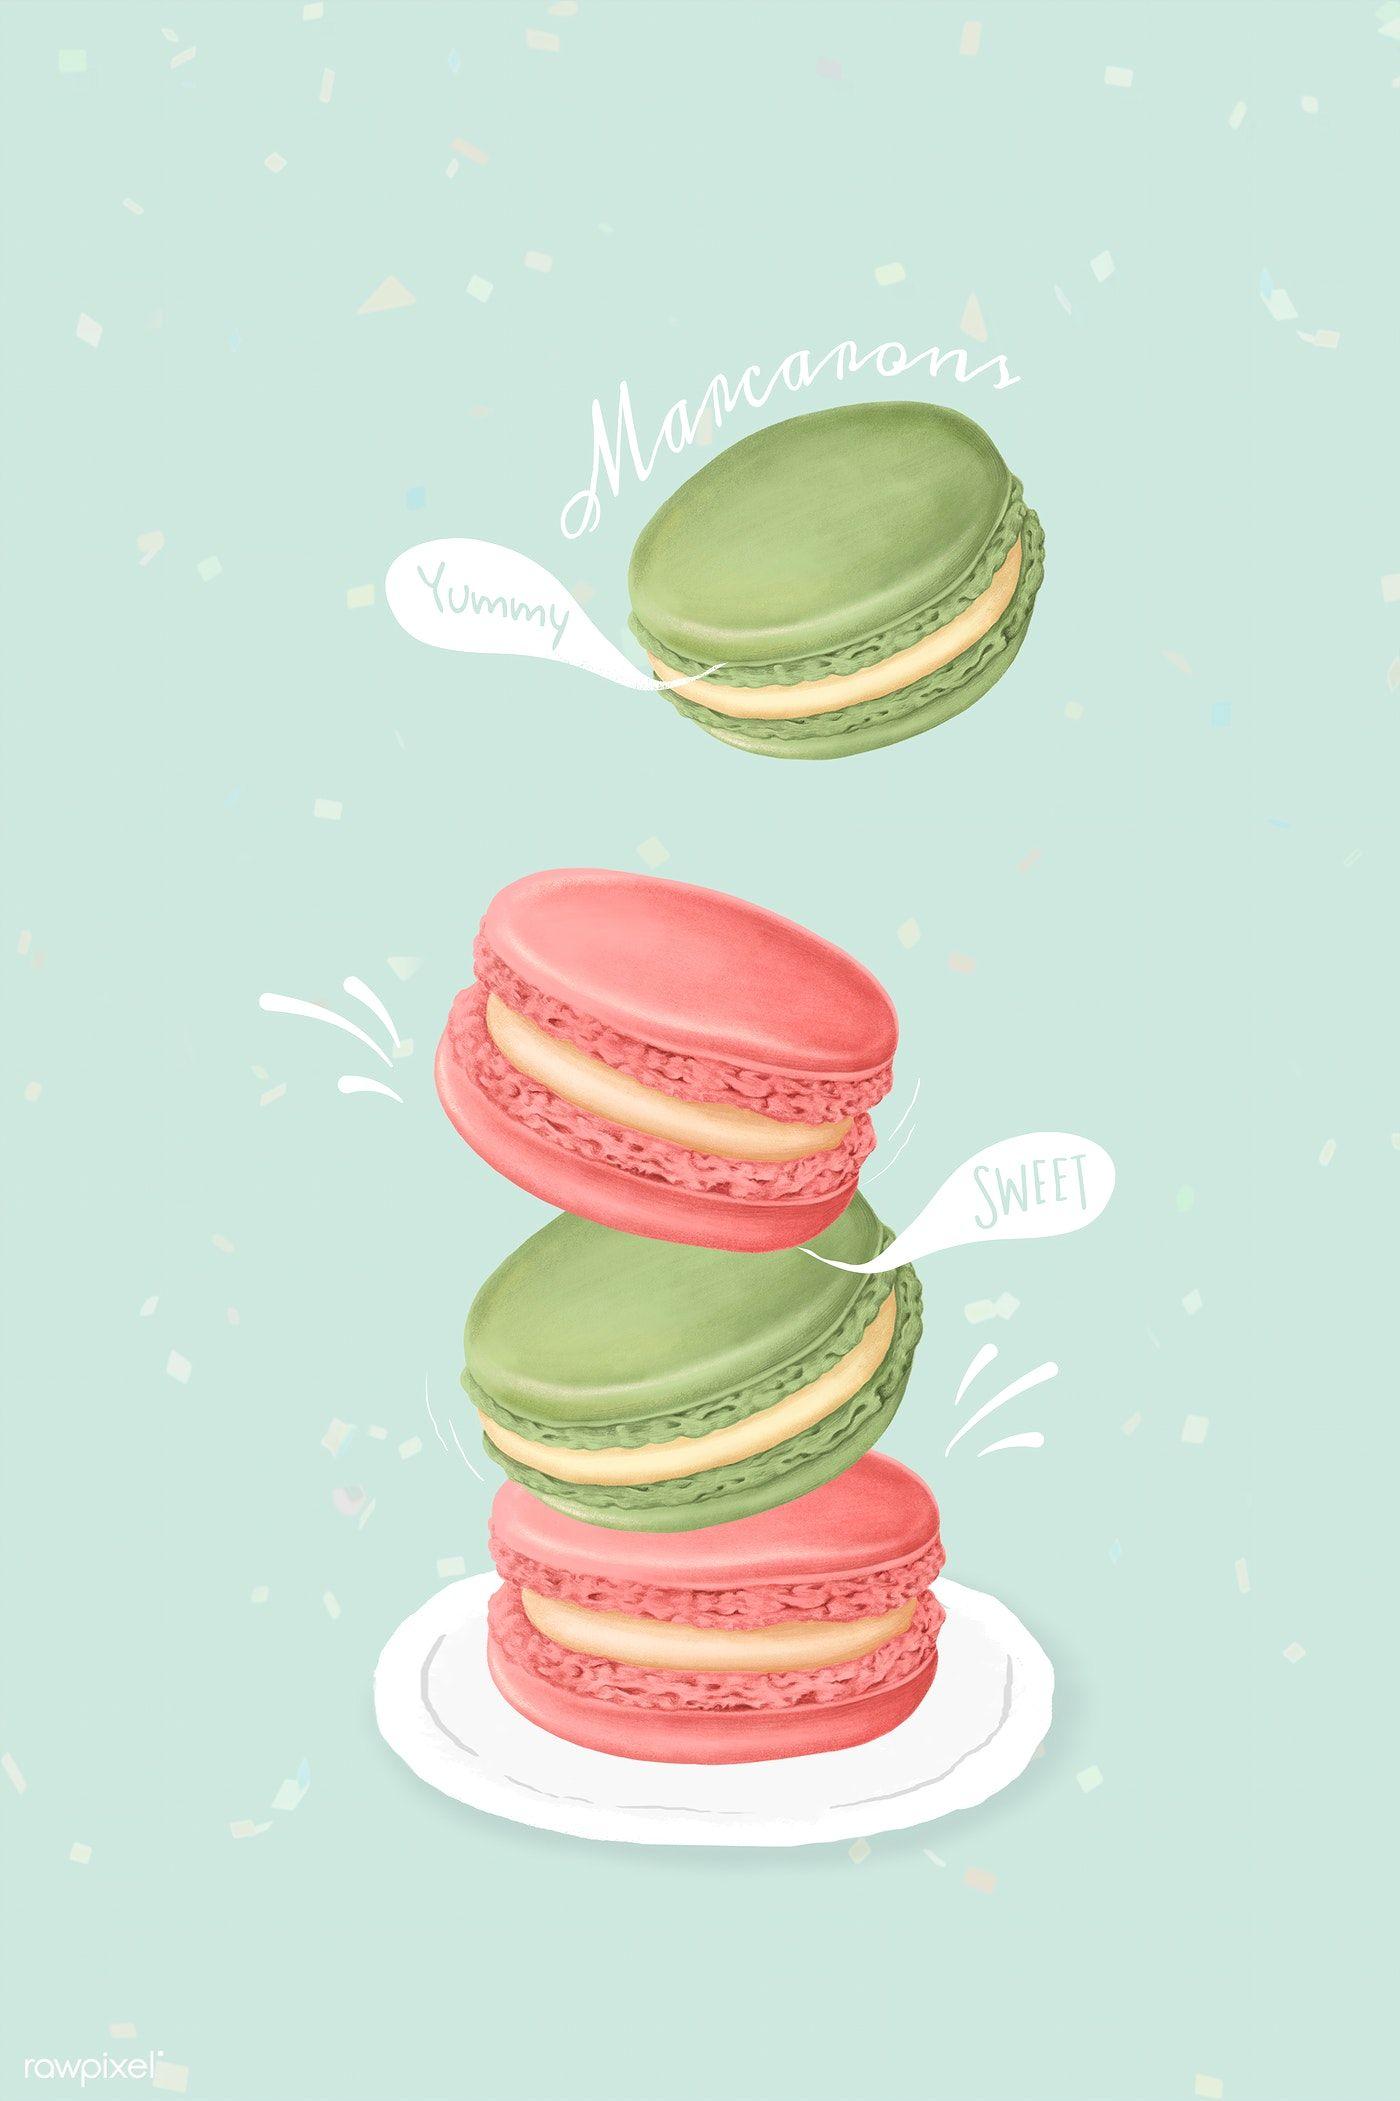 Hand drawn sweet macarons mockup free image by rawpixel